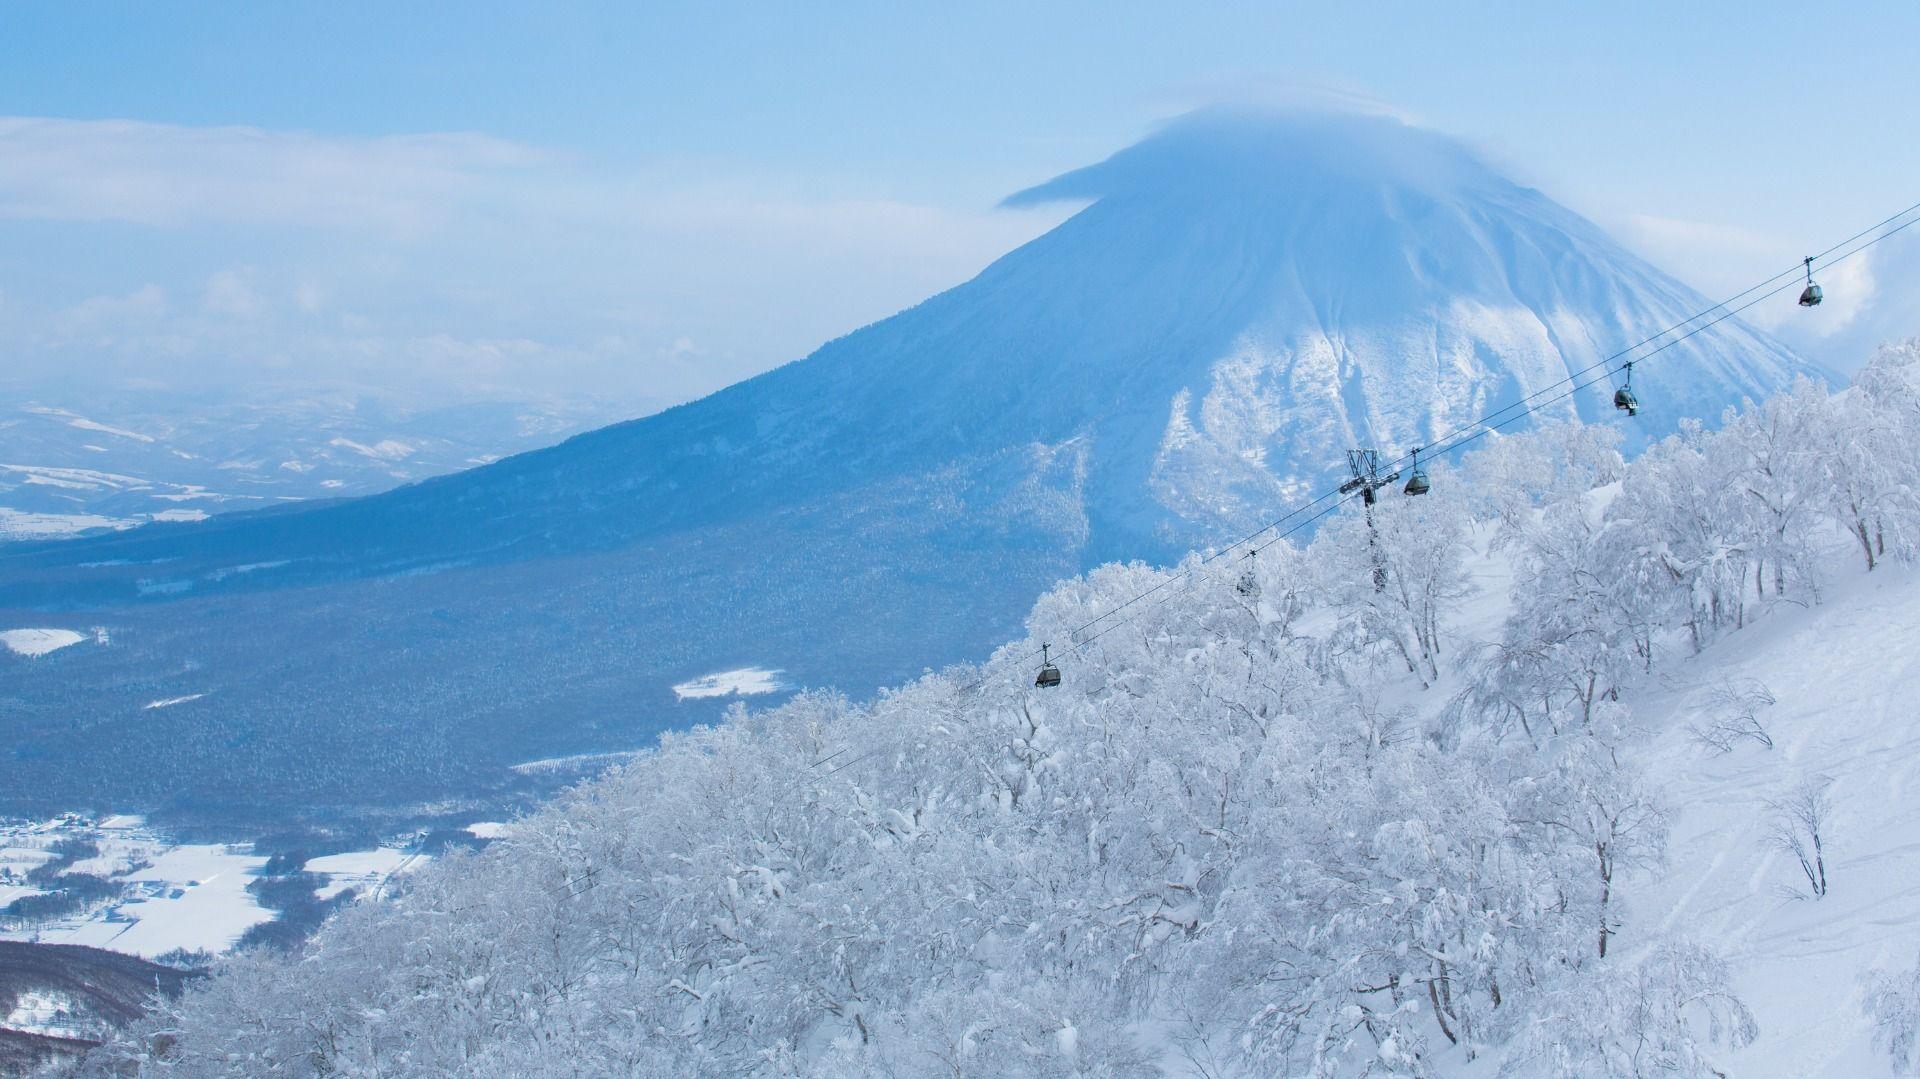 The Hotspot for Powder Snow - Niseko Hanazono Resort